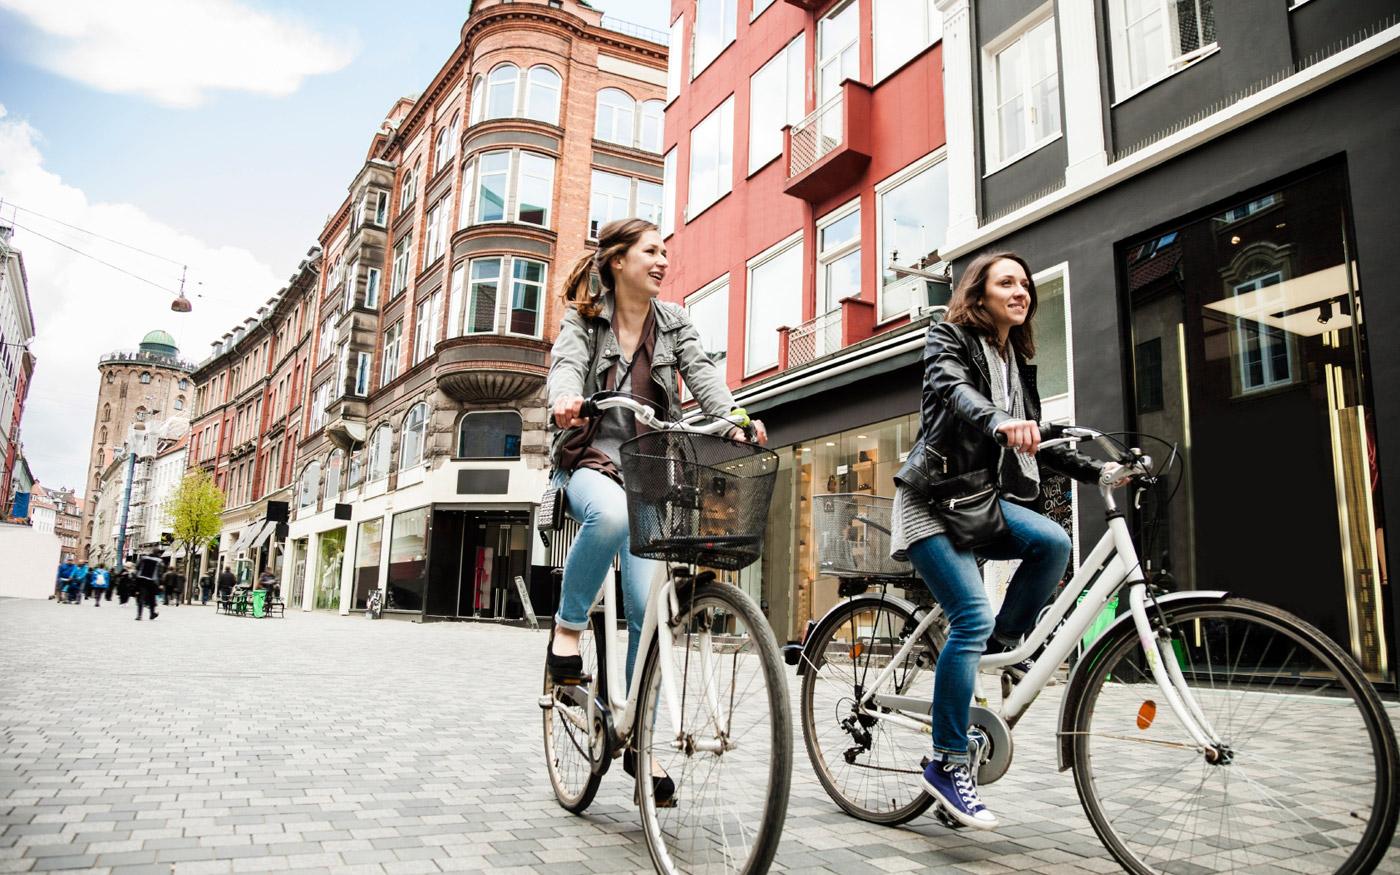 Copenhagen has more bicycle than people